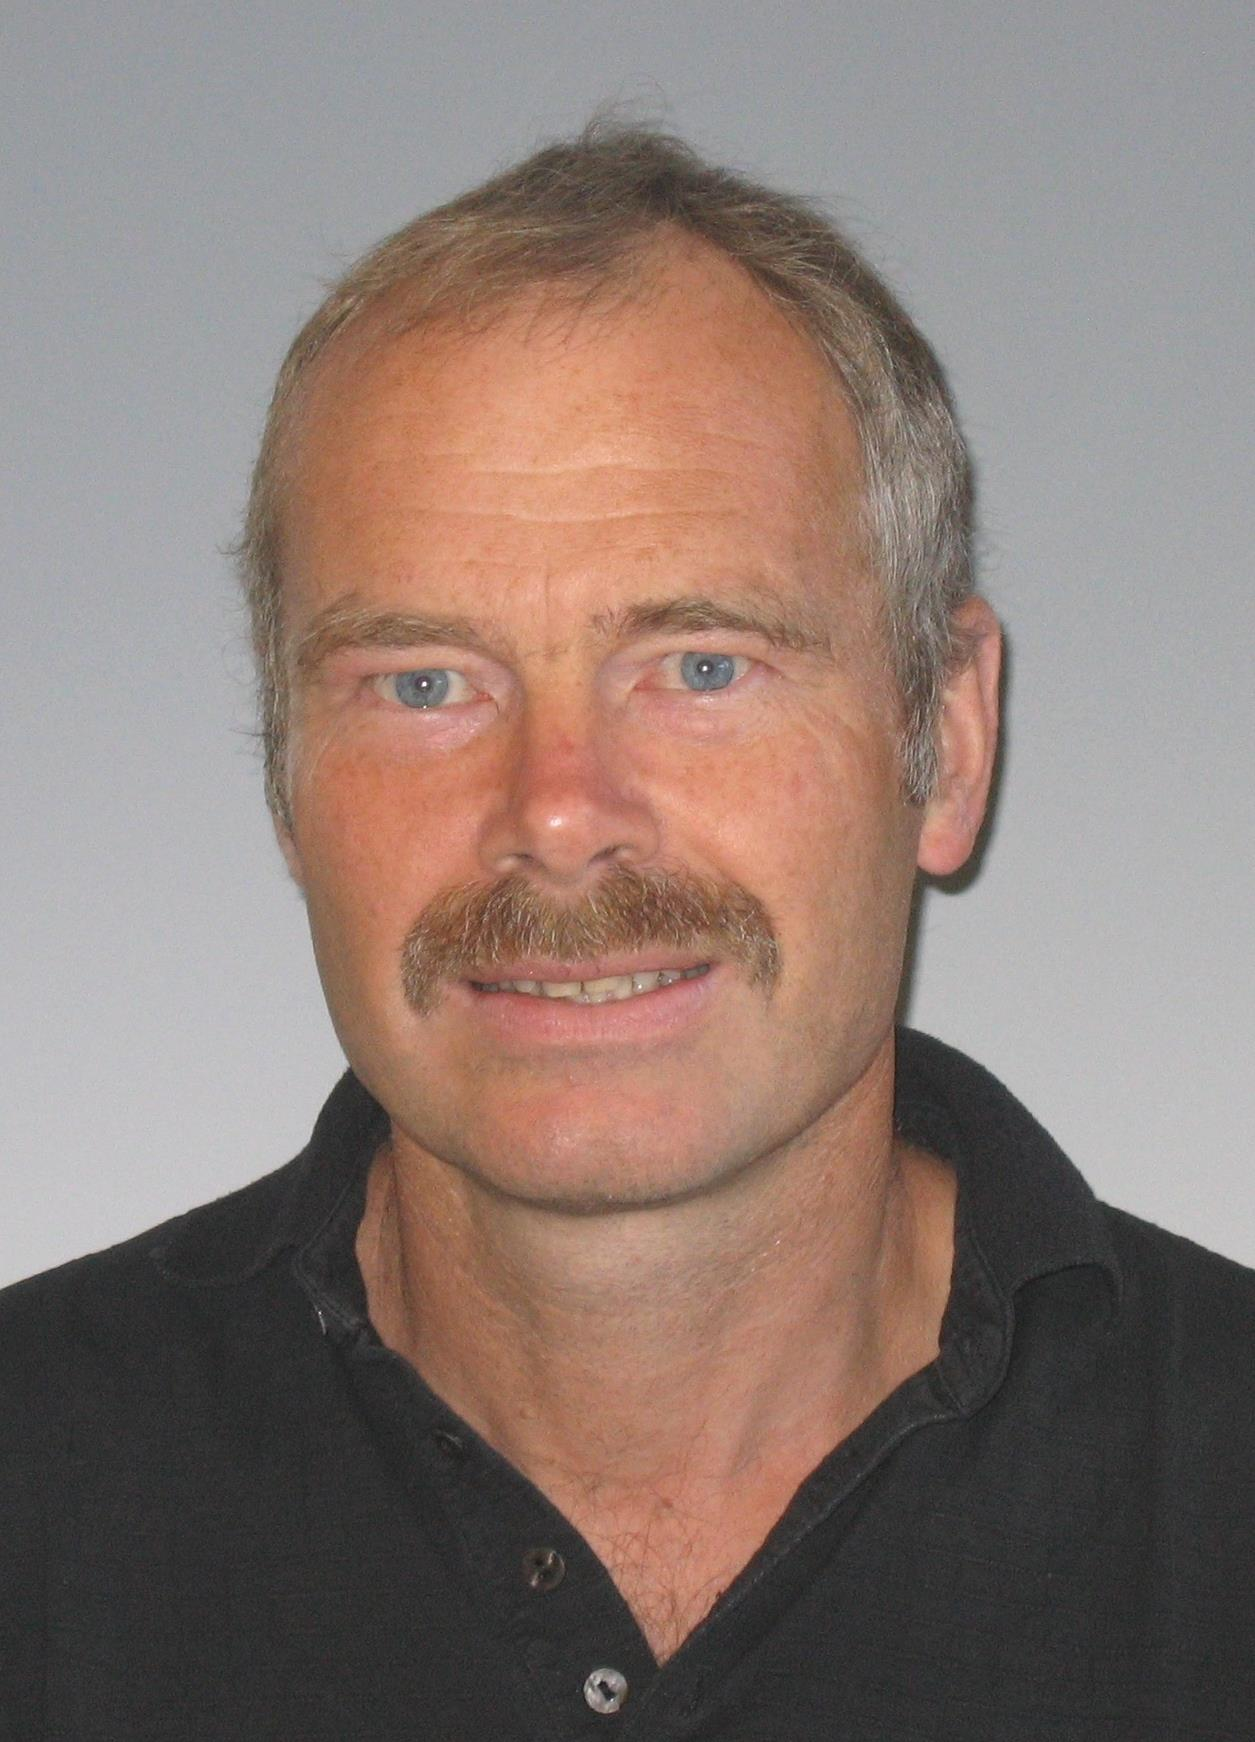 Jan Tind Sørensen